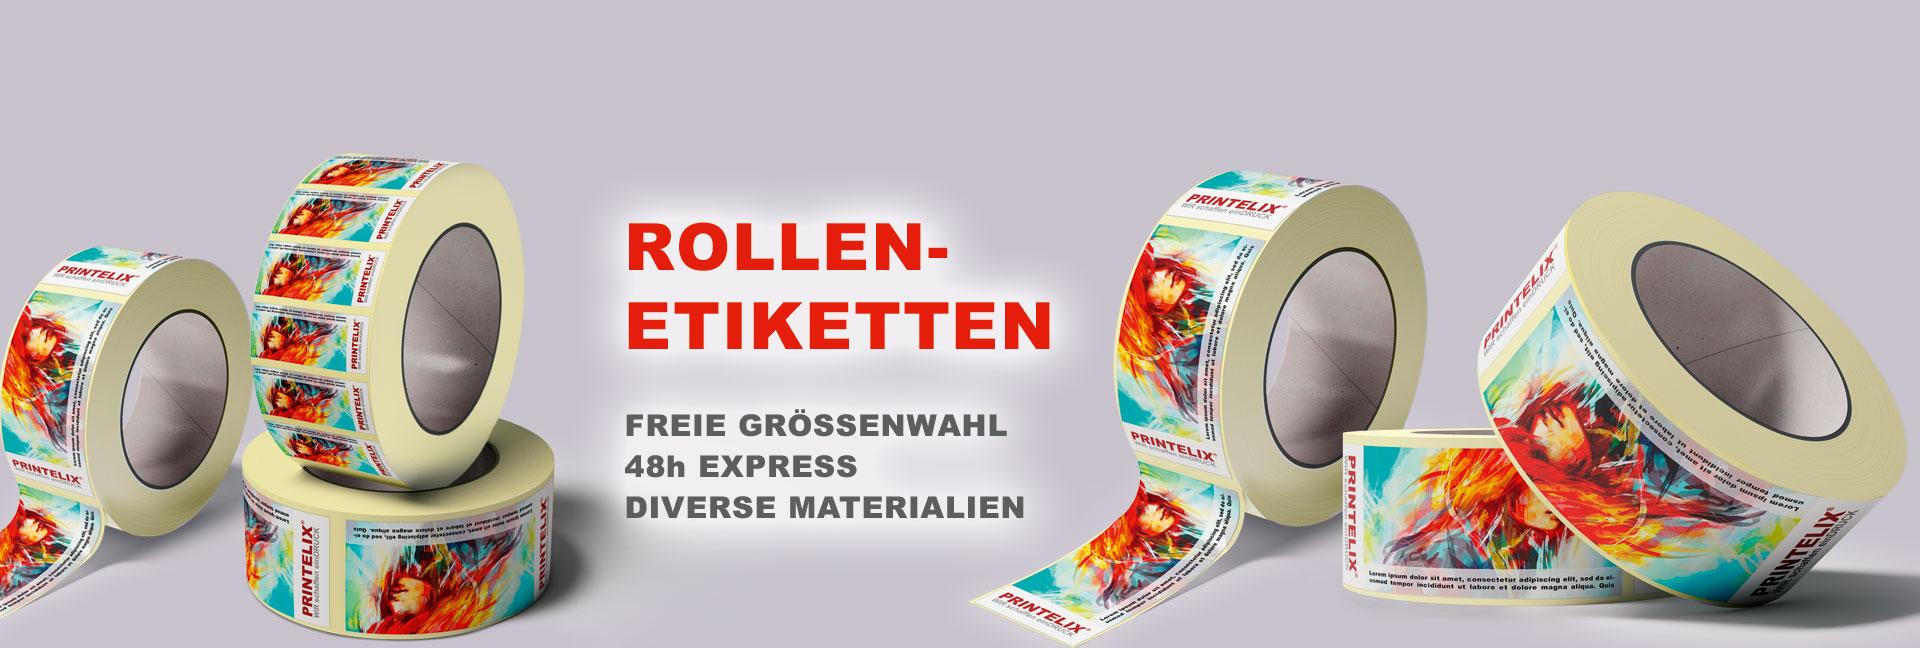 Printelix De Die Qualitäts Druckerei